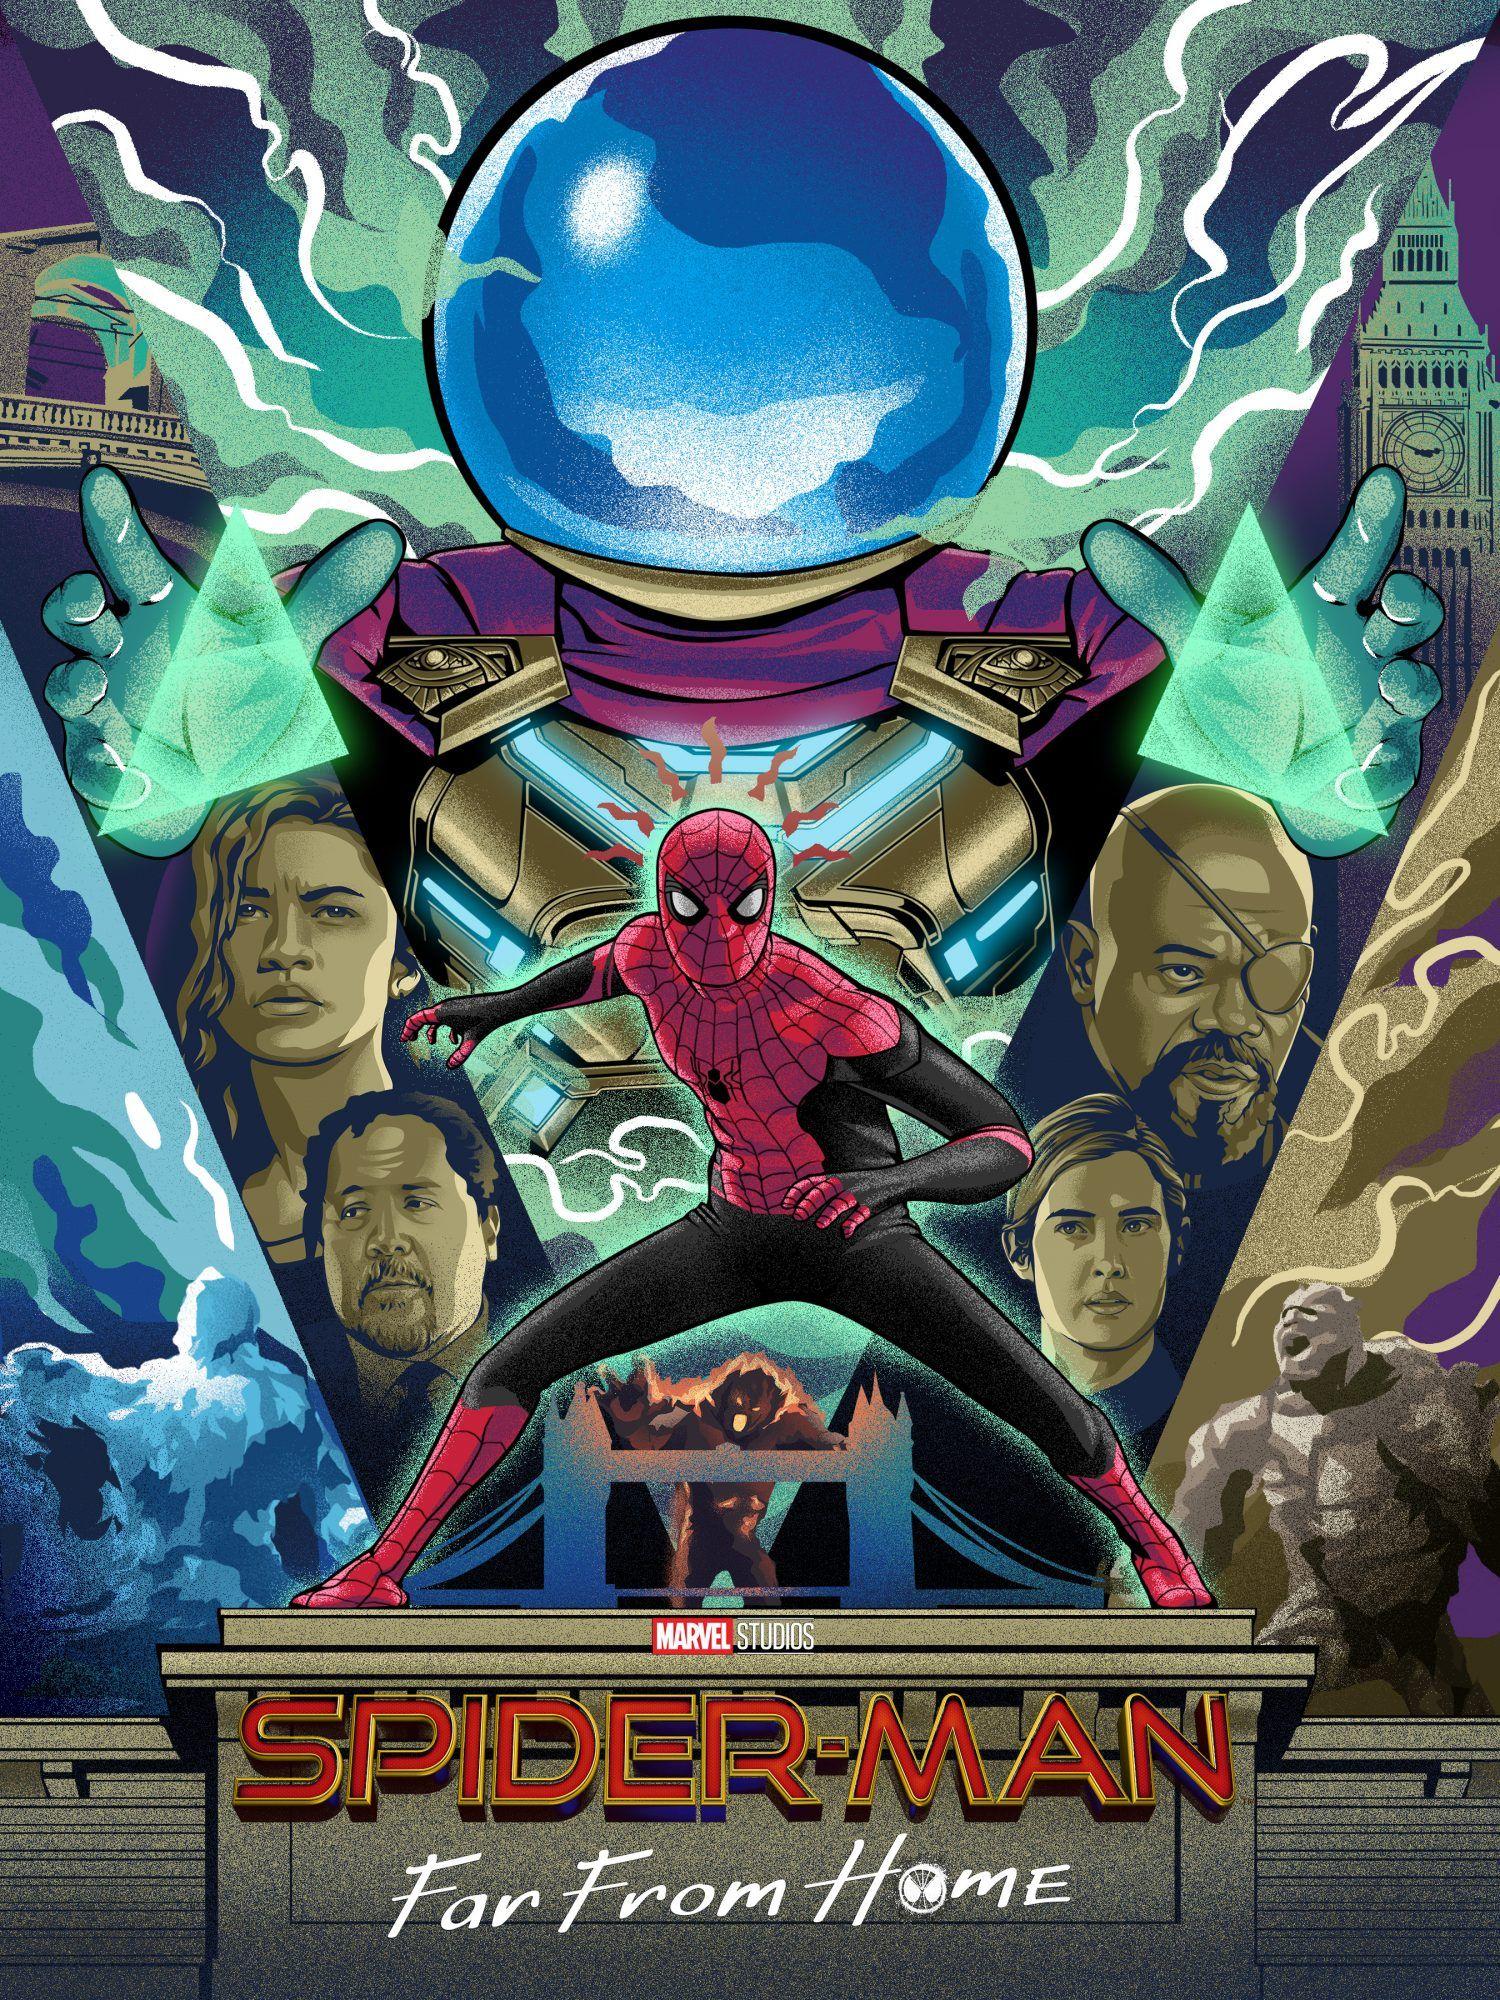 SpiderMan Far From Home (2019) [1500 x 2000] Heróis